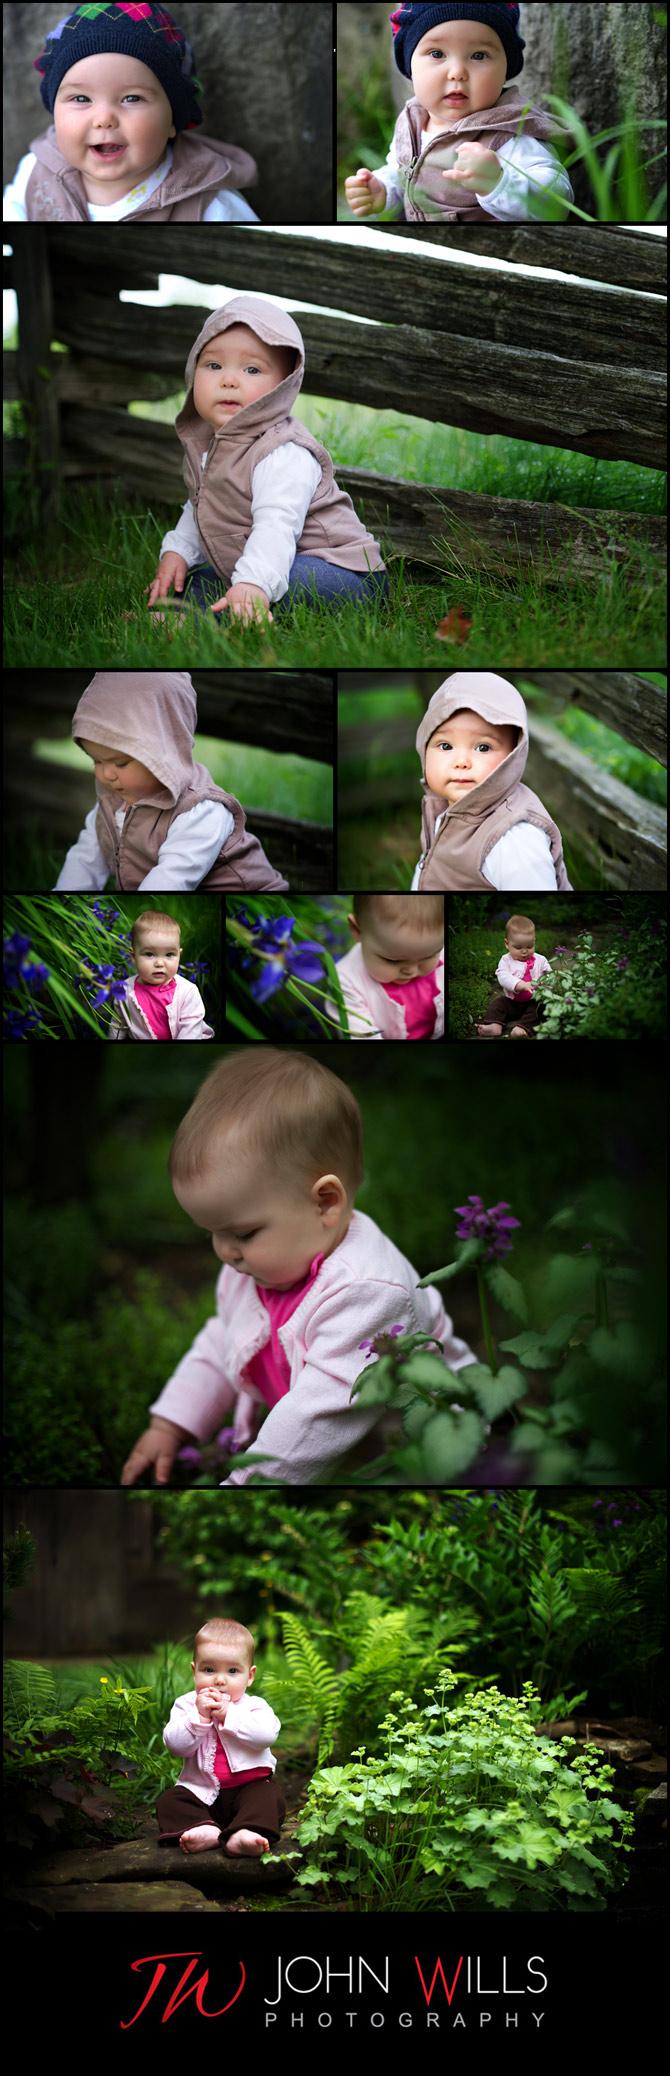 Children Photographers in Kitchener and Waterloo